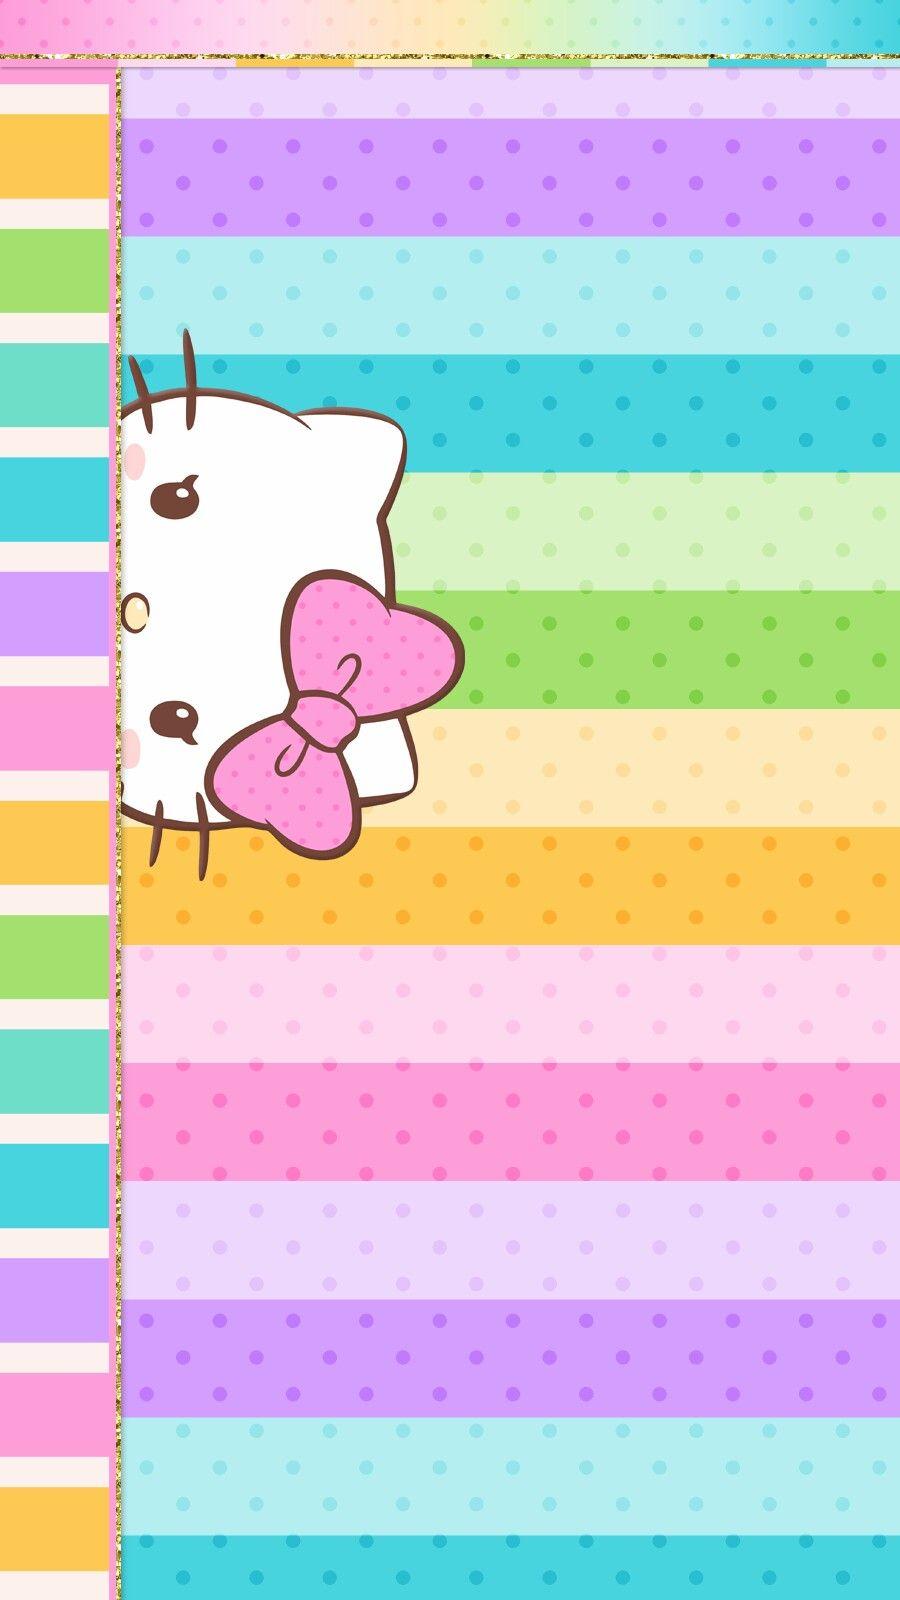 Beautiful Wallpaper Hello Kitty Butterfly - 679daede79da10da2ca174537126c371  Picture_481672.jpg